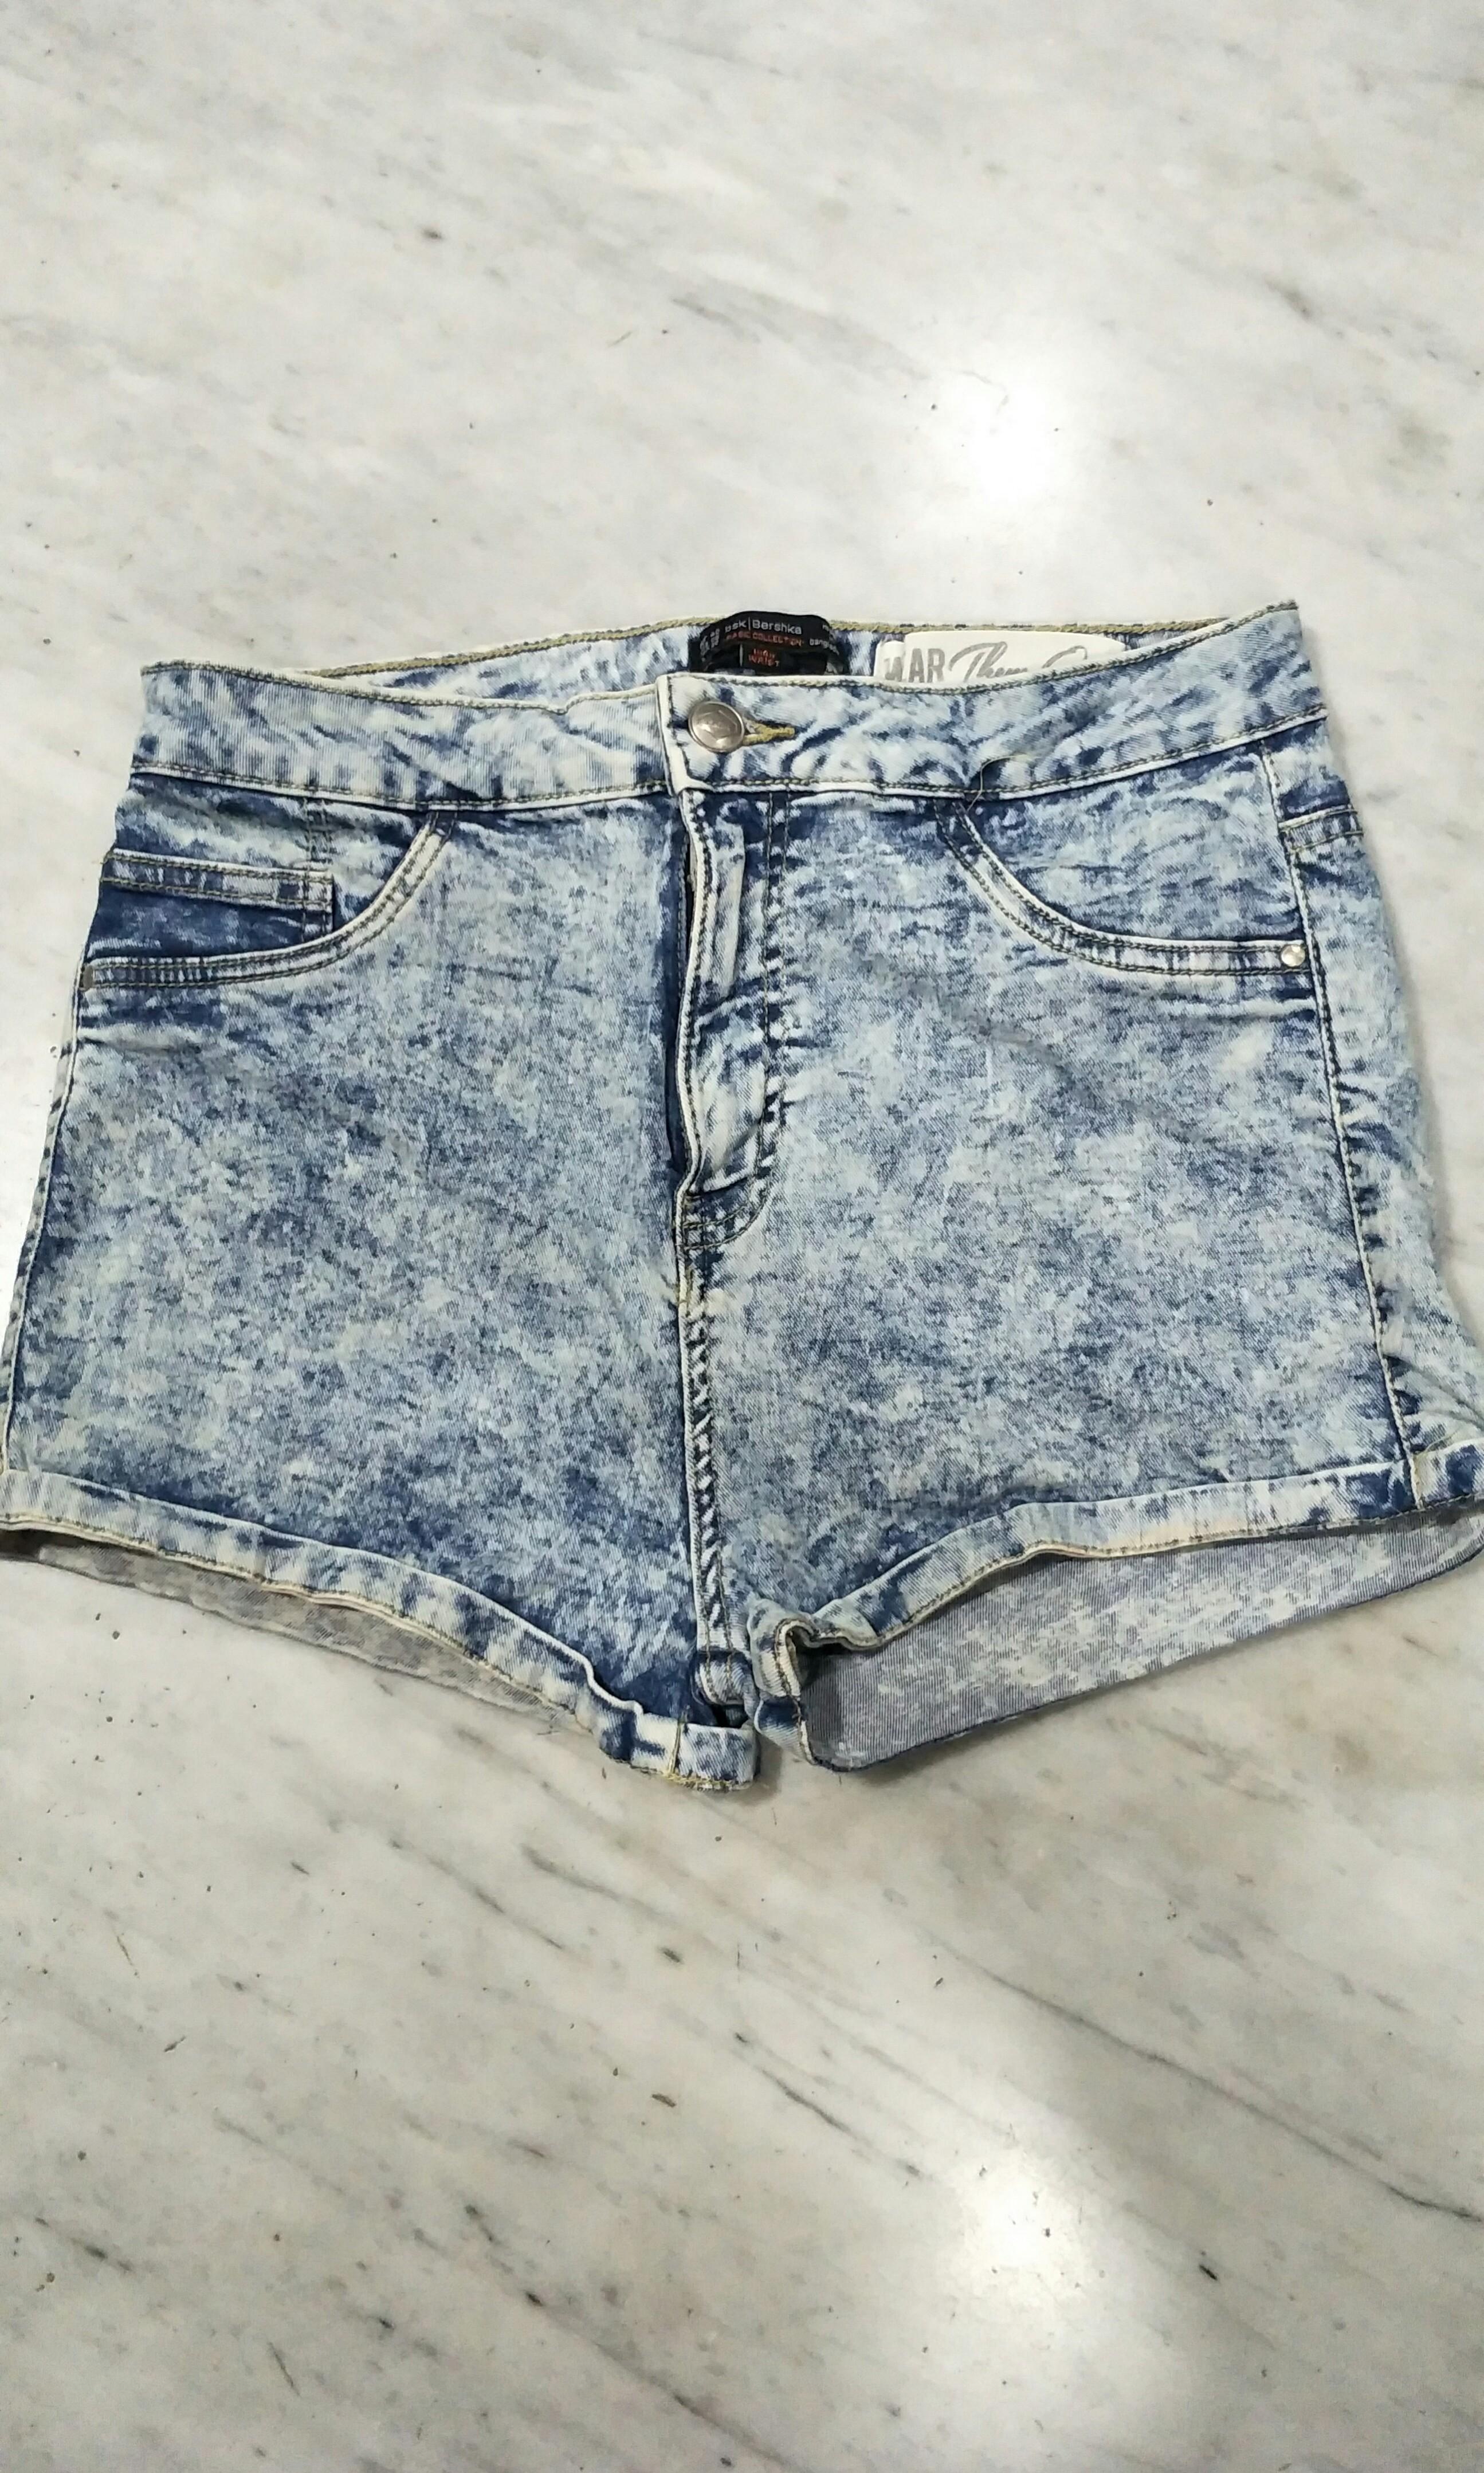 7b4ffa2ab5b5 Bershka High Waisted Denim Shorts, Women's Fashion, Clothes, Pants ...